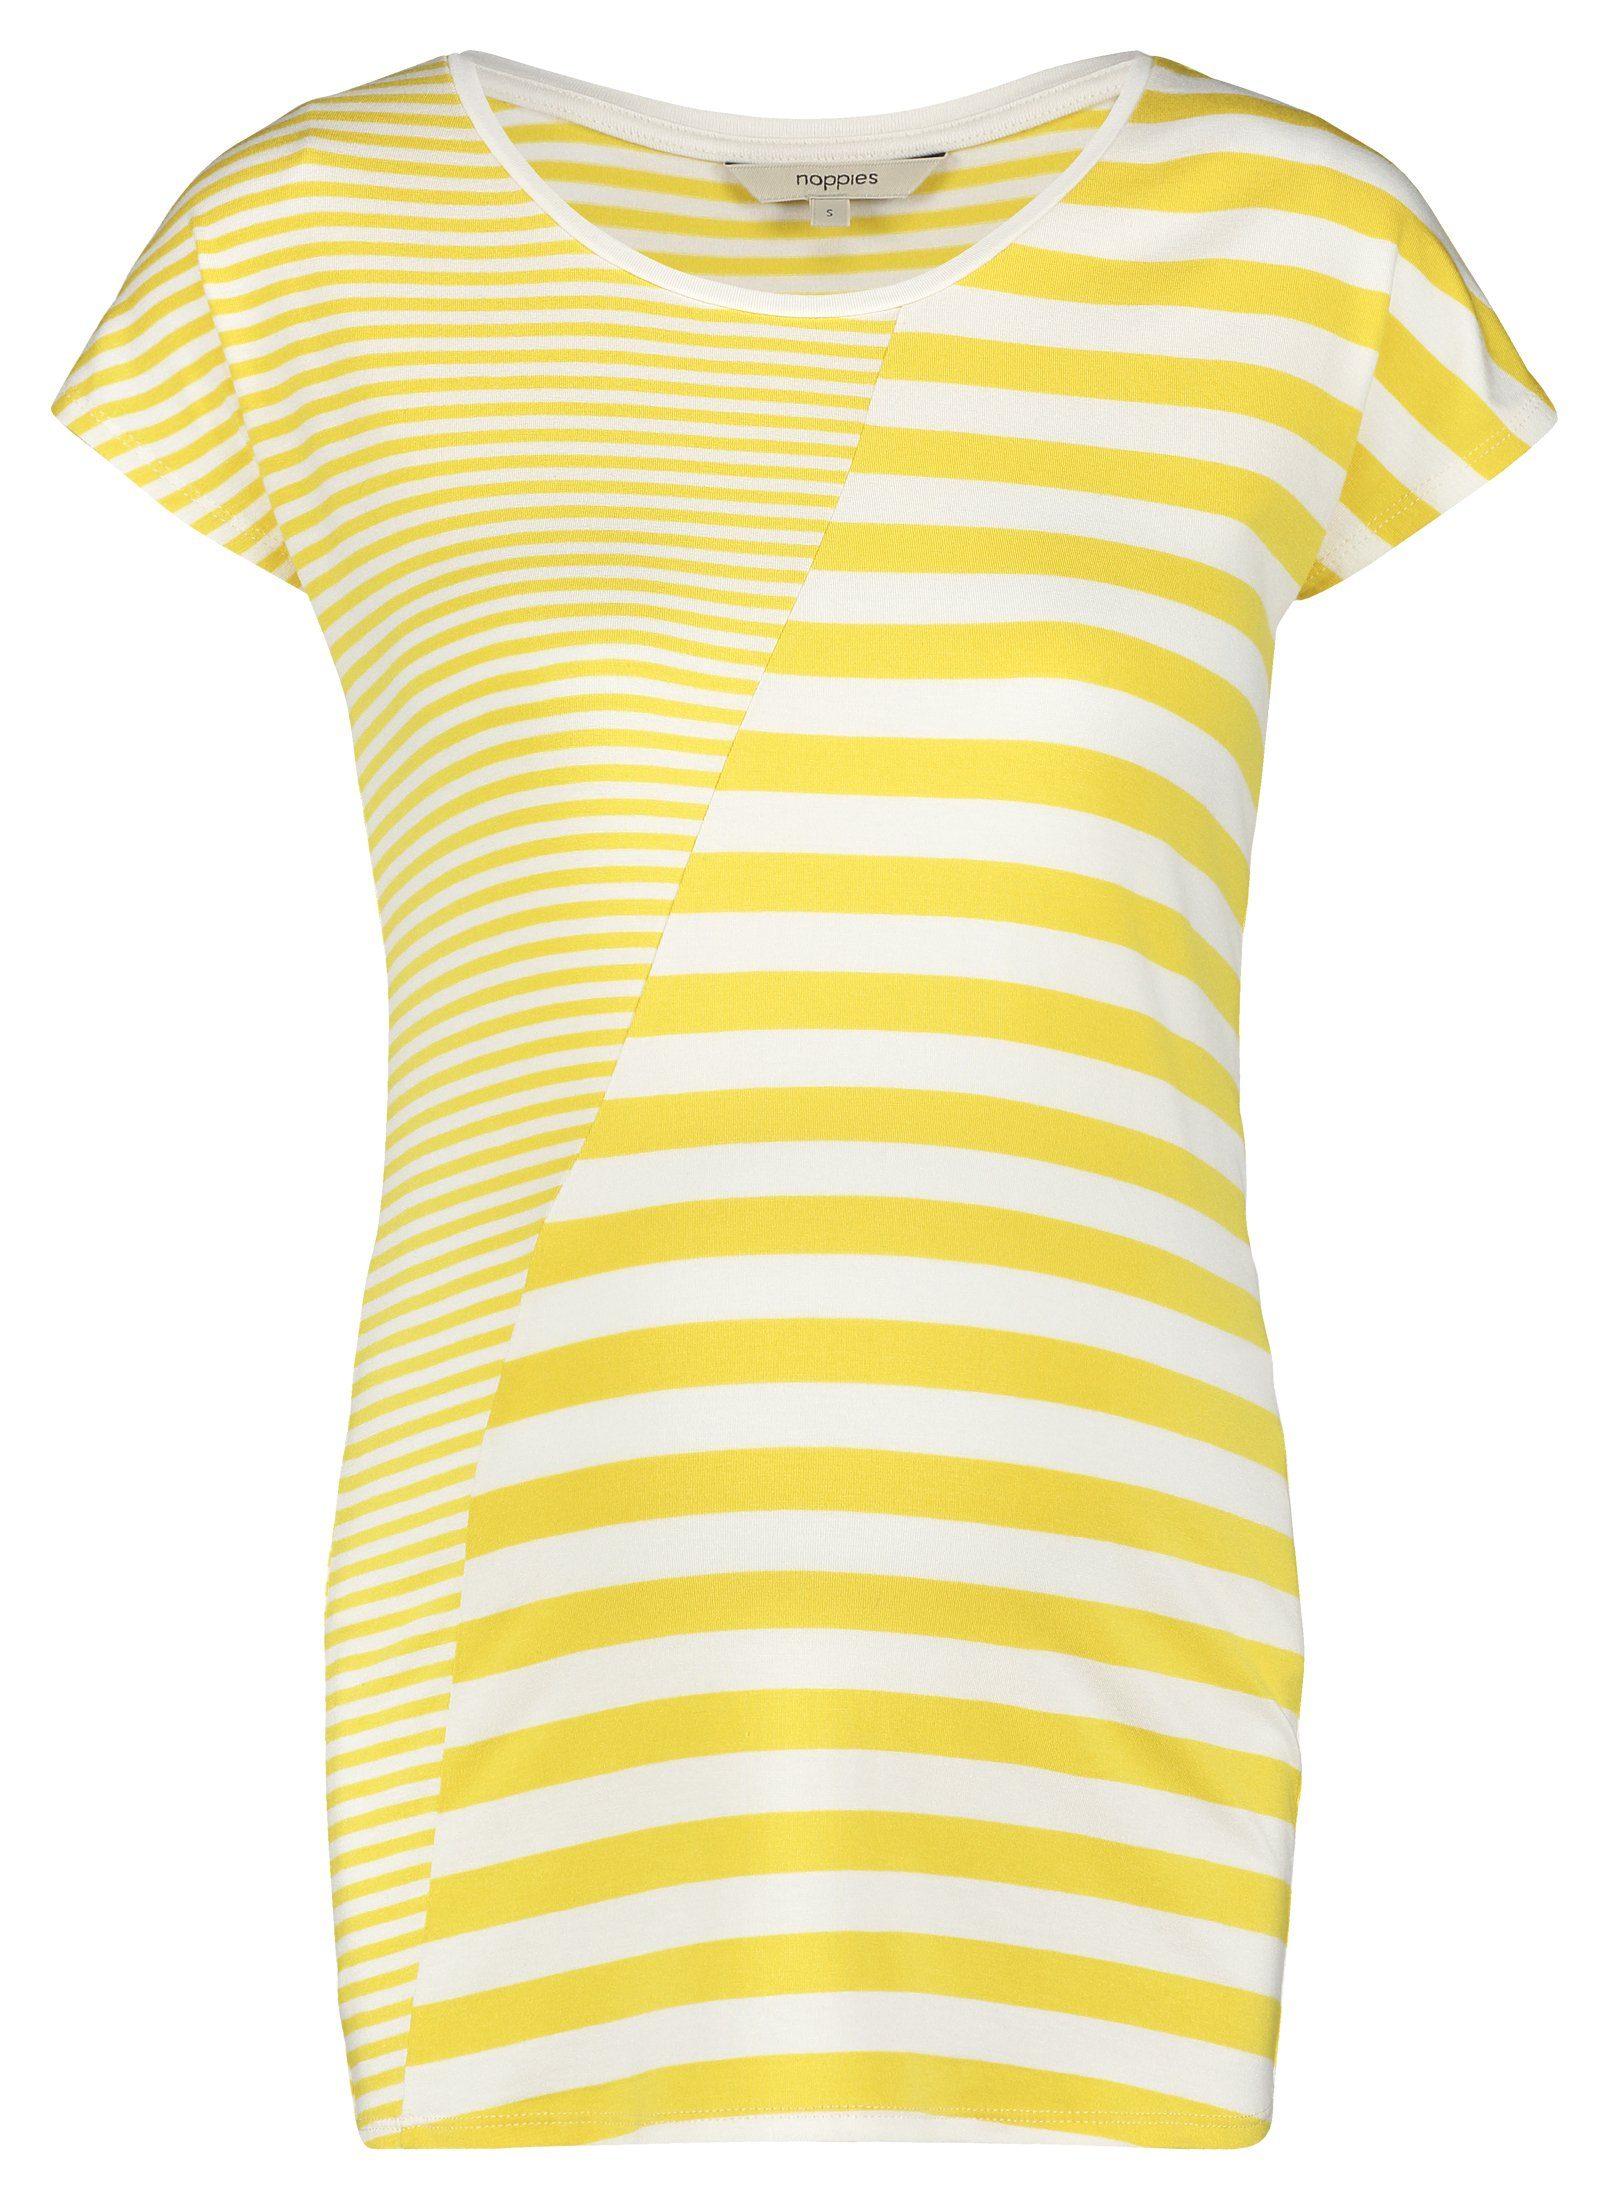 NOPPIES T-shirt »Noni«